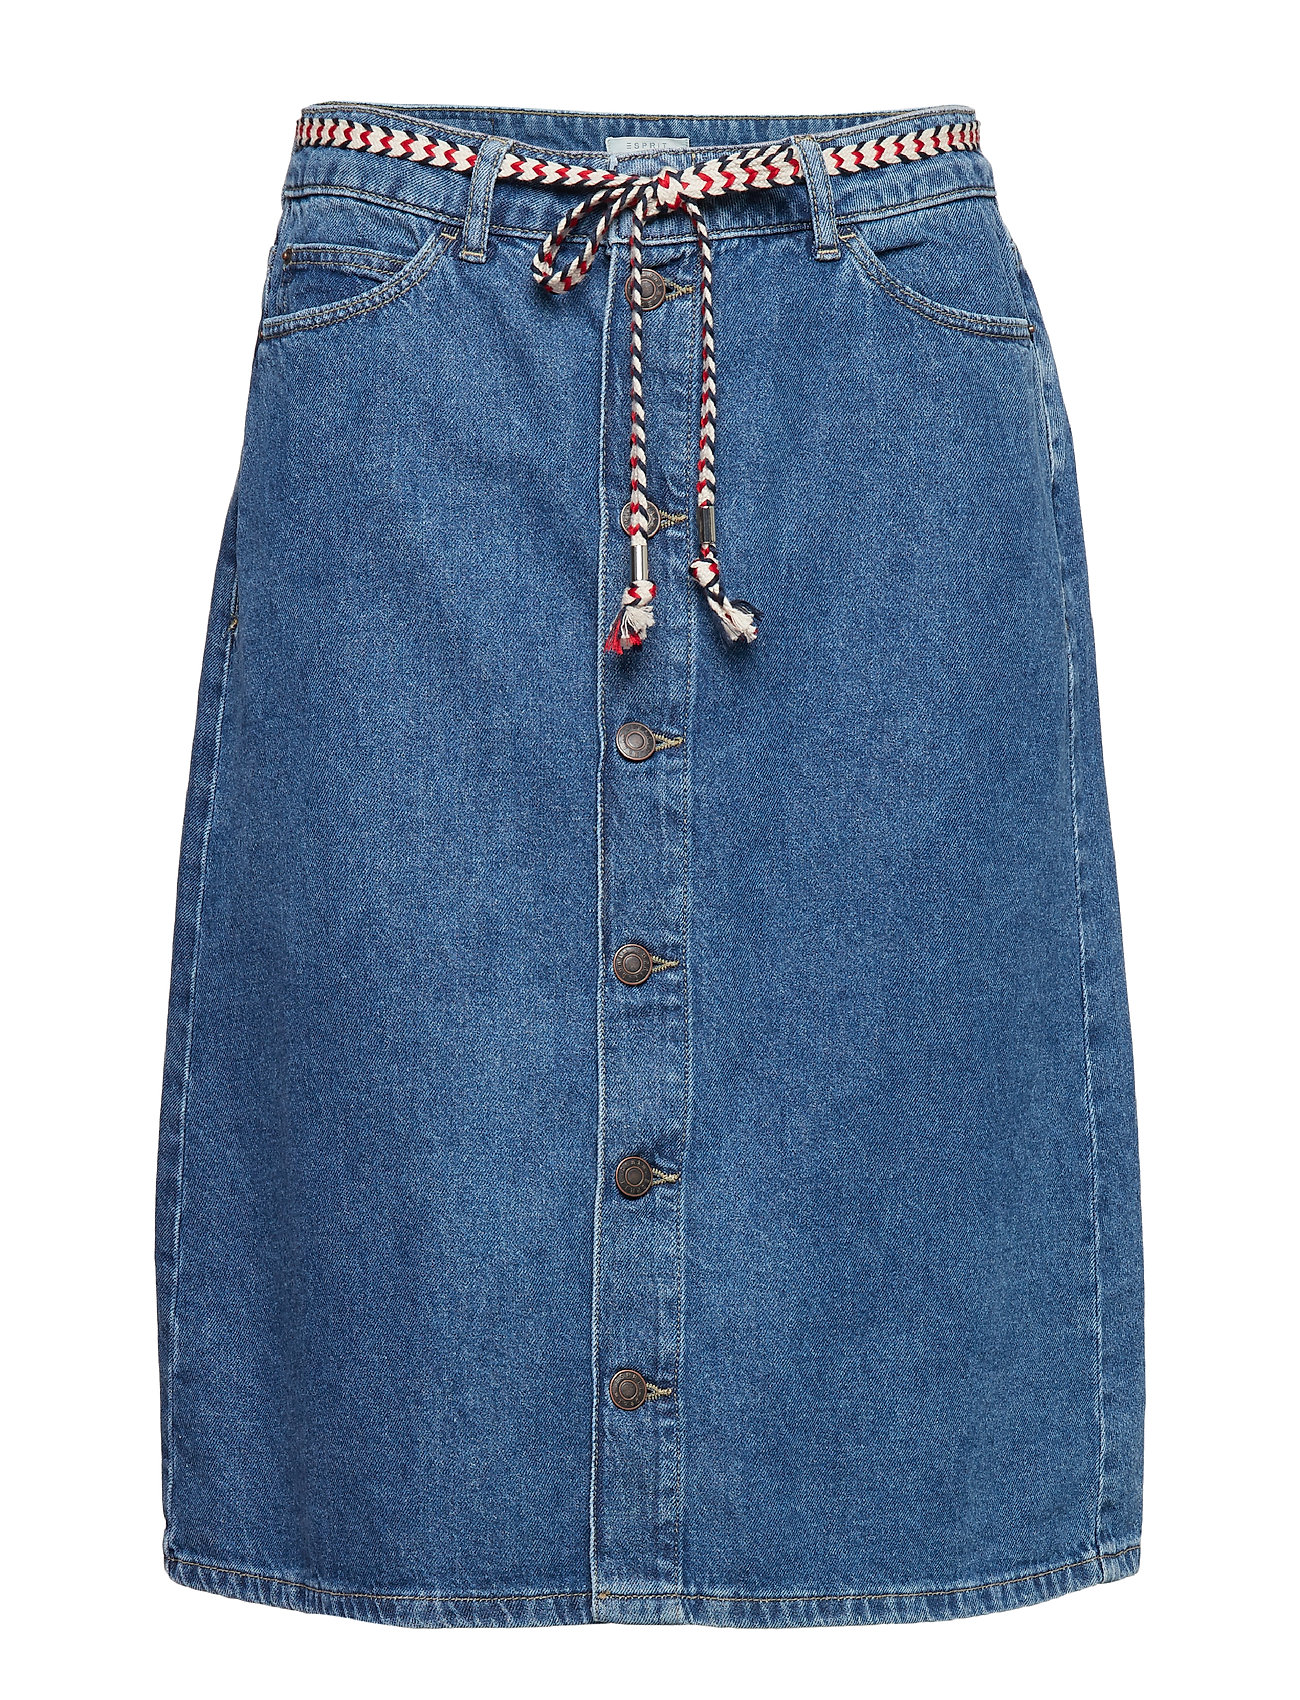 eb05c081d9c0 Skirts Denim (Blue Medium Wash) (479.99 kr) - Esprit Casual ...